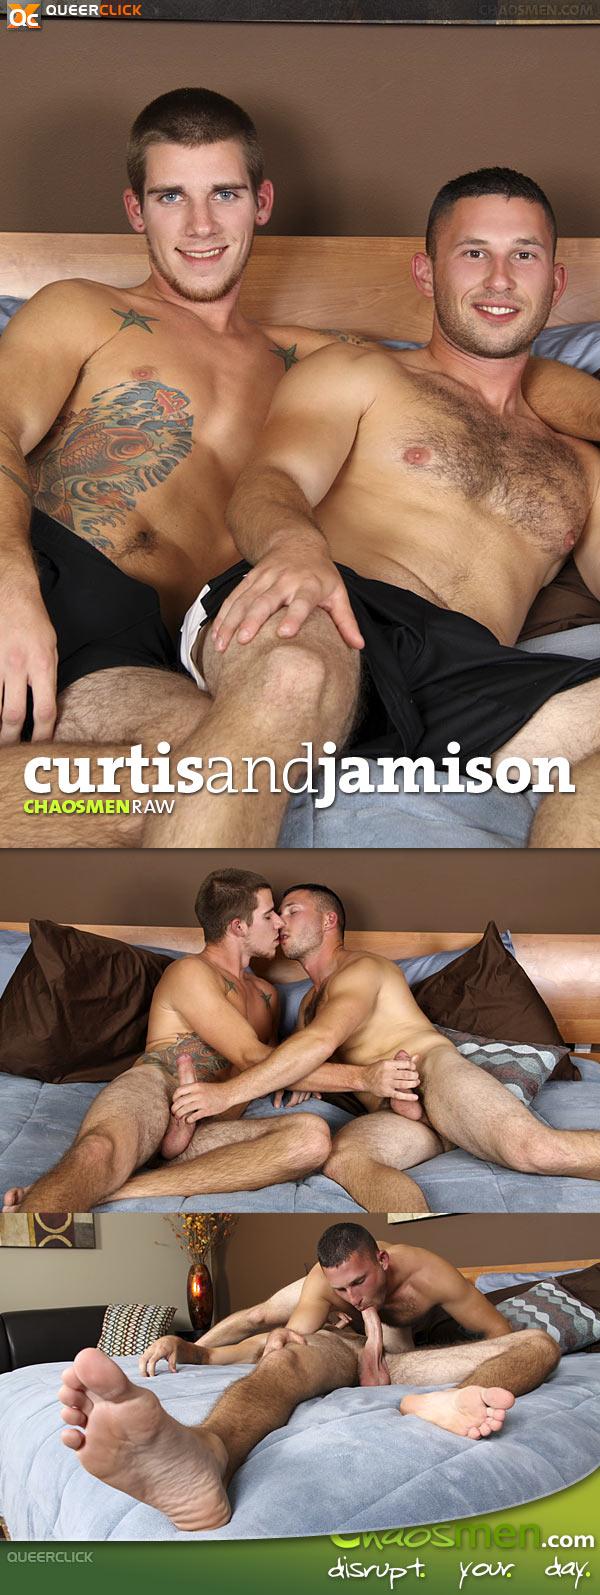 cm-curtis-jamison-raw-00.jpg